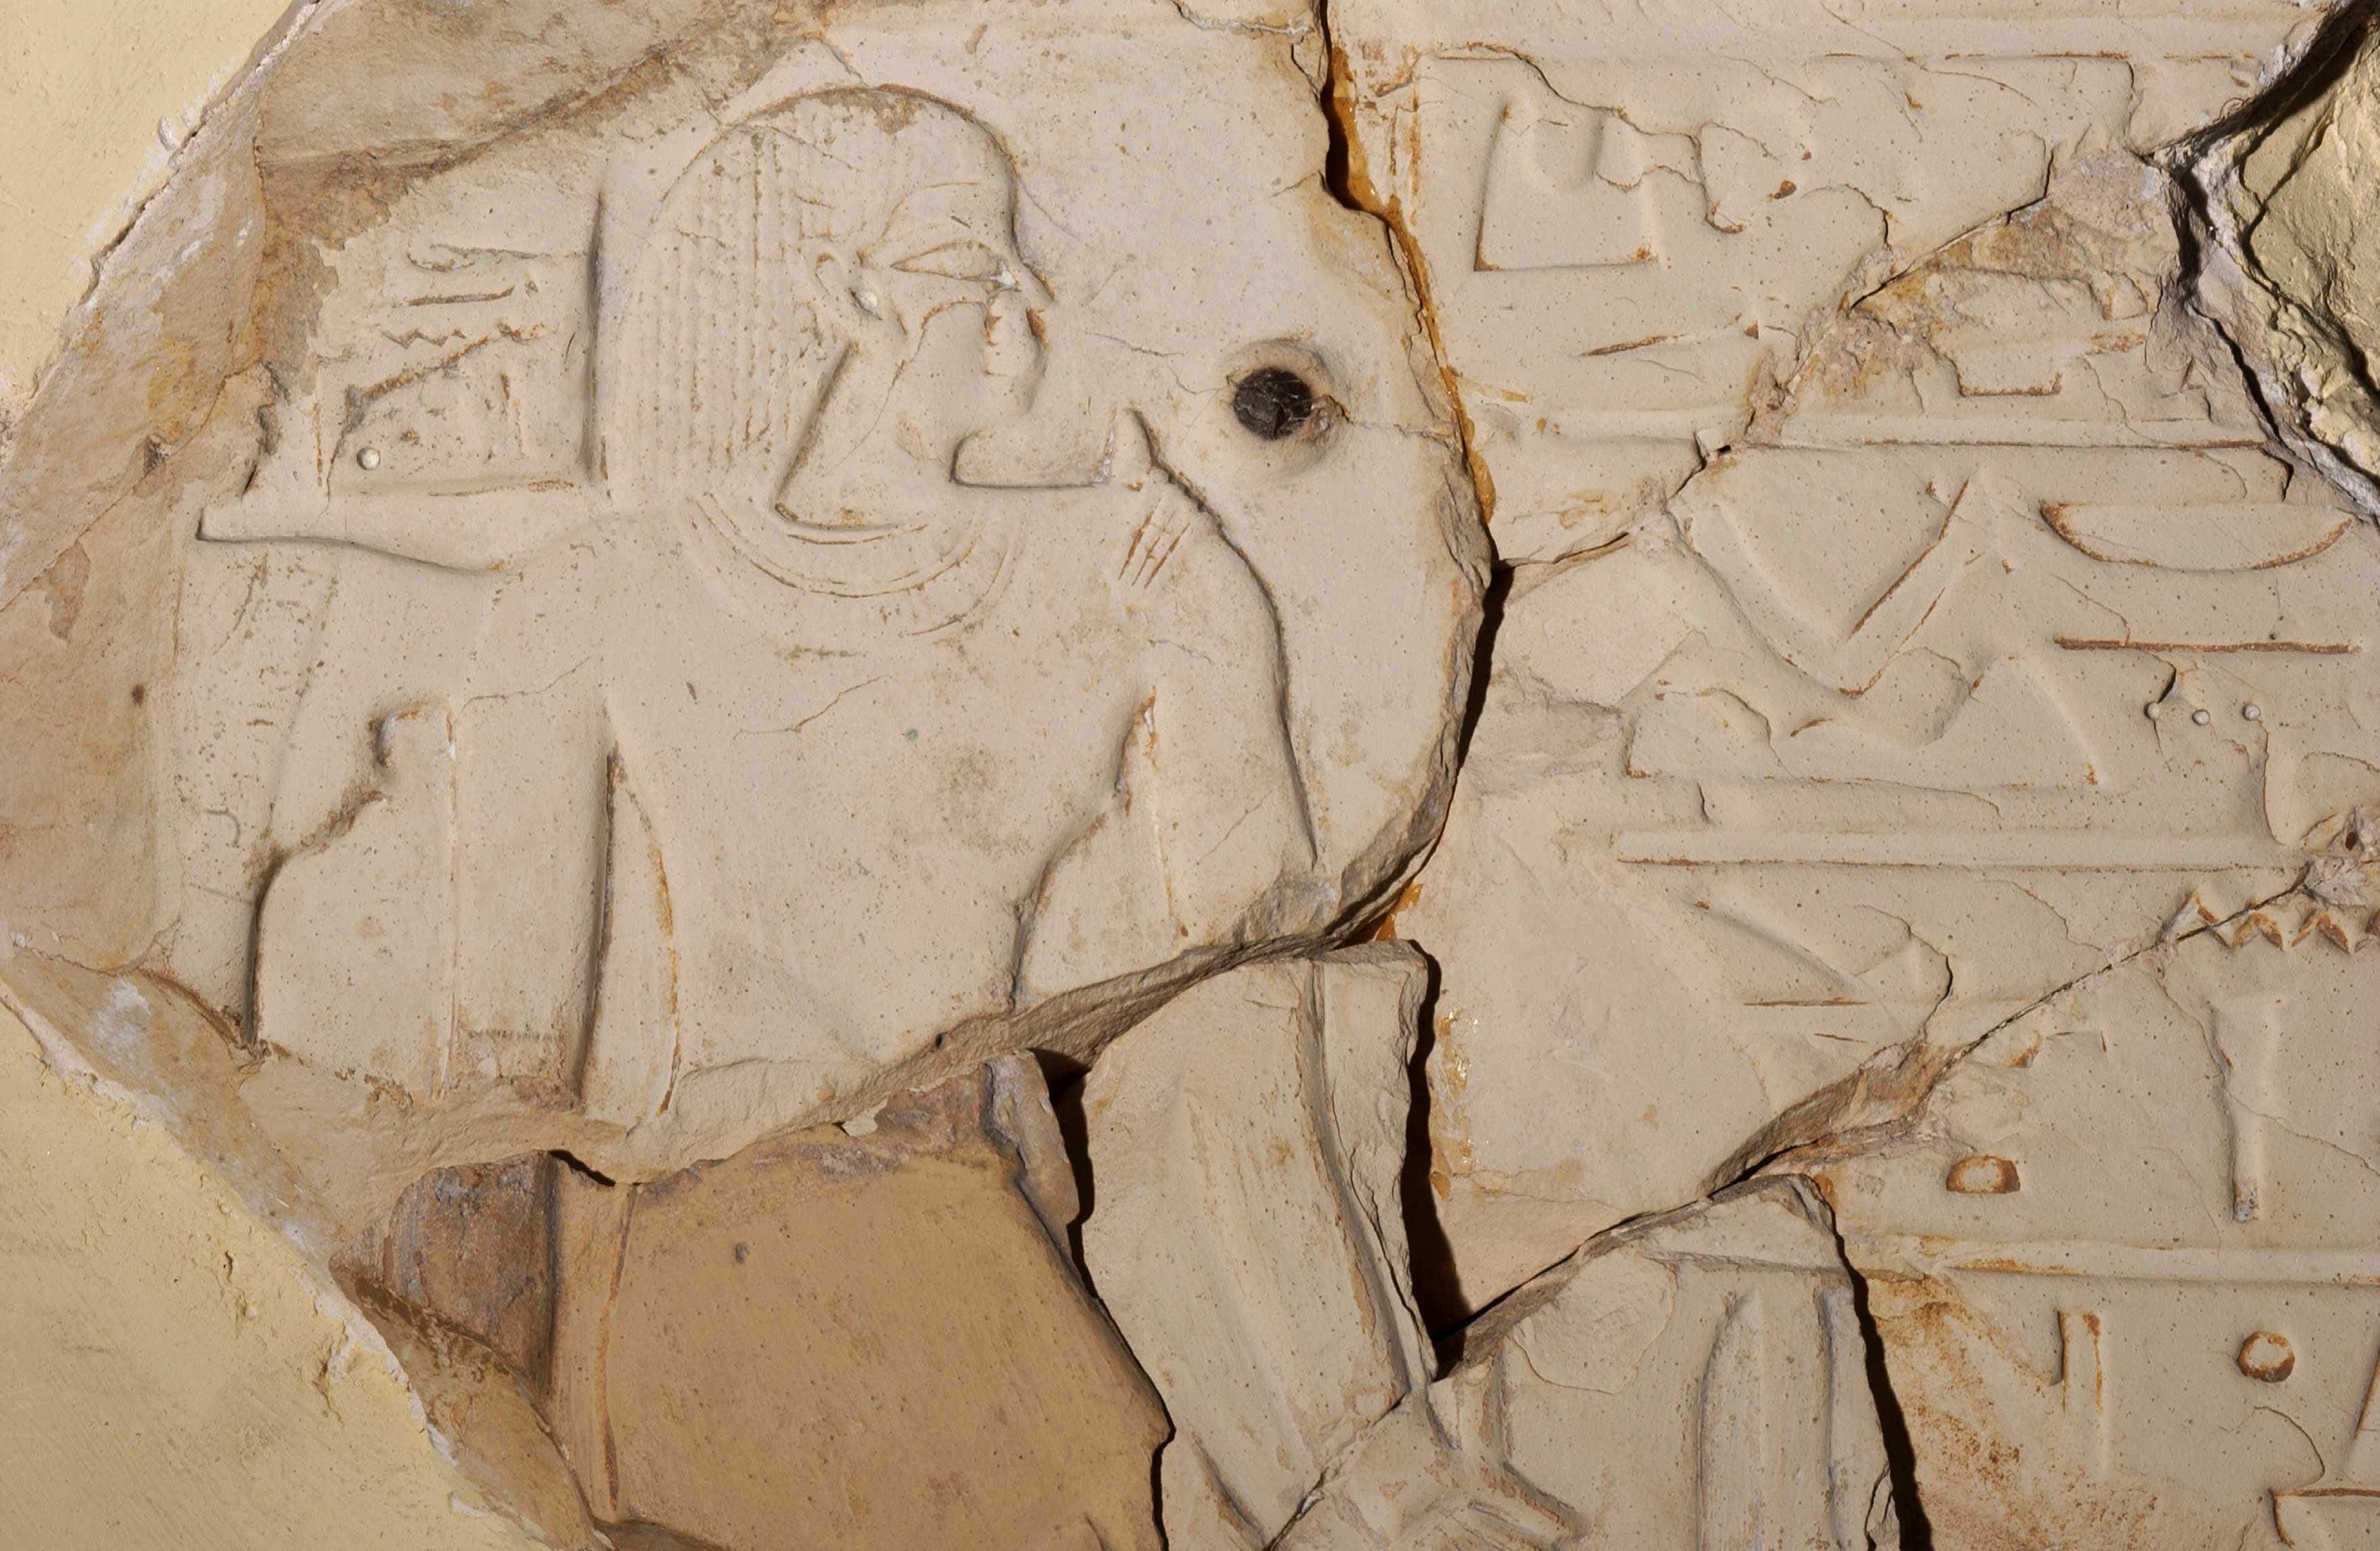 Stela of Bebi fragment